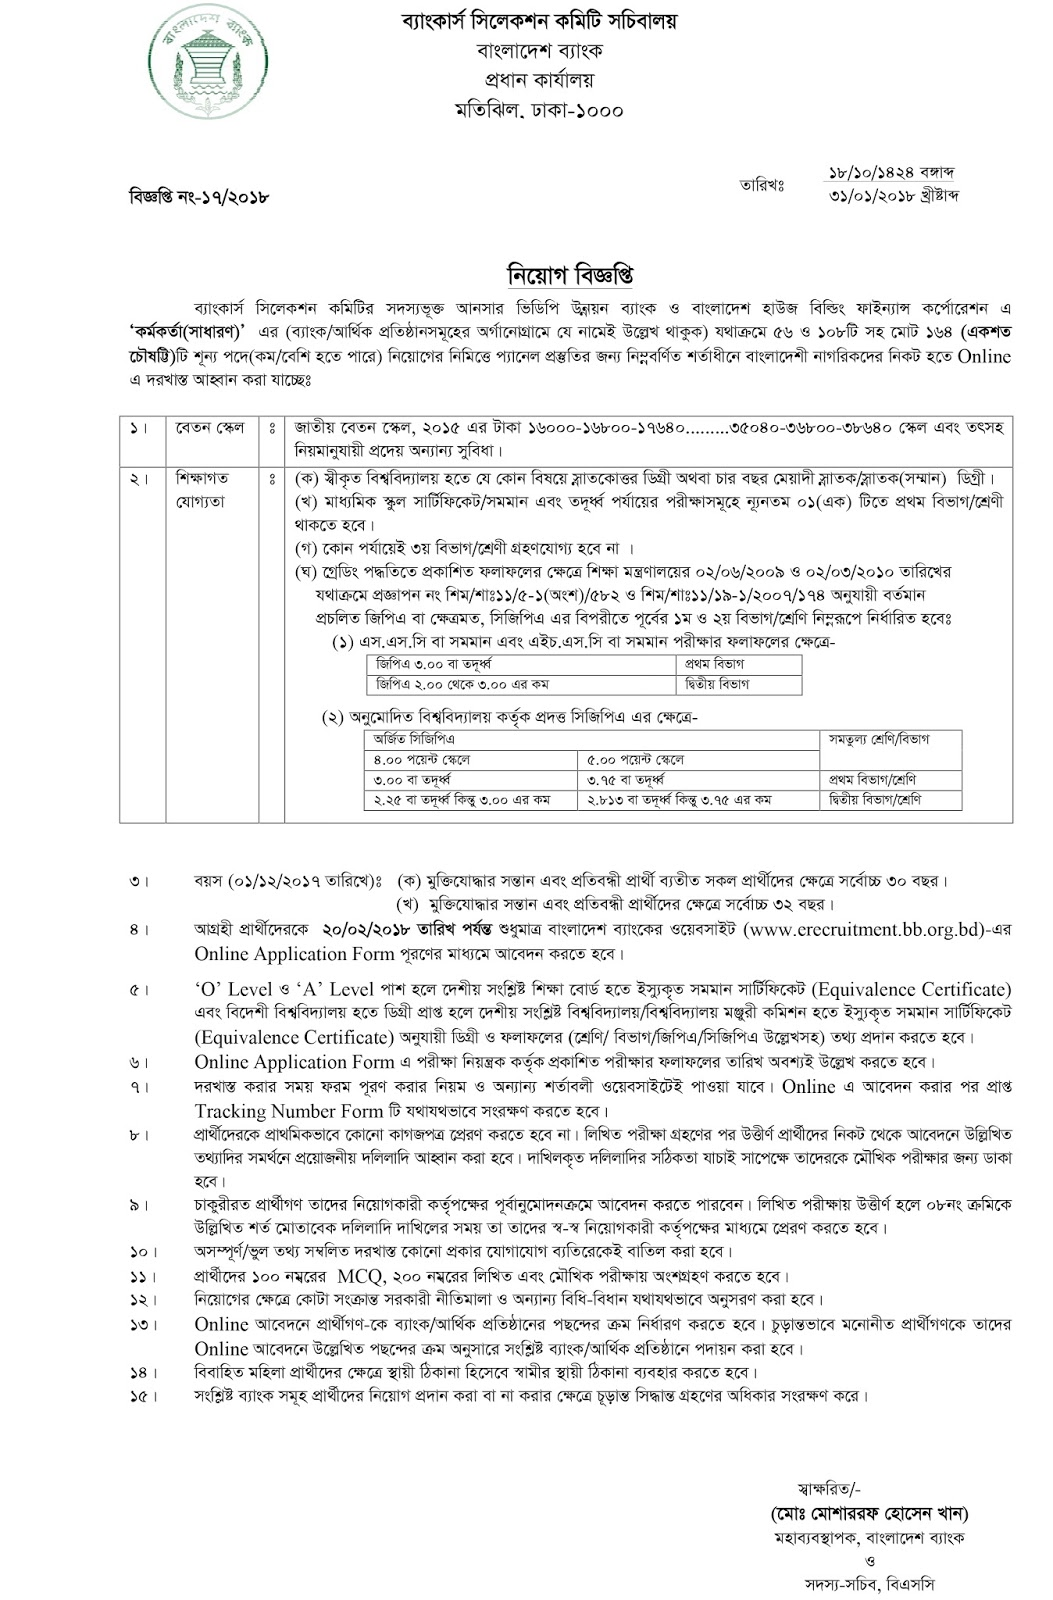 Ansar VDP Unnoyon Bank And HBFC Exam Notice - dailyjobsbd